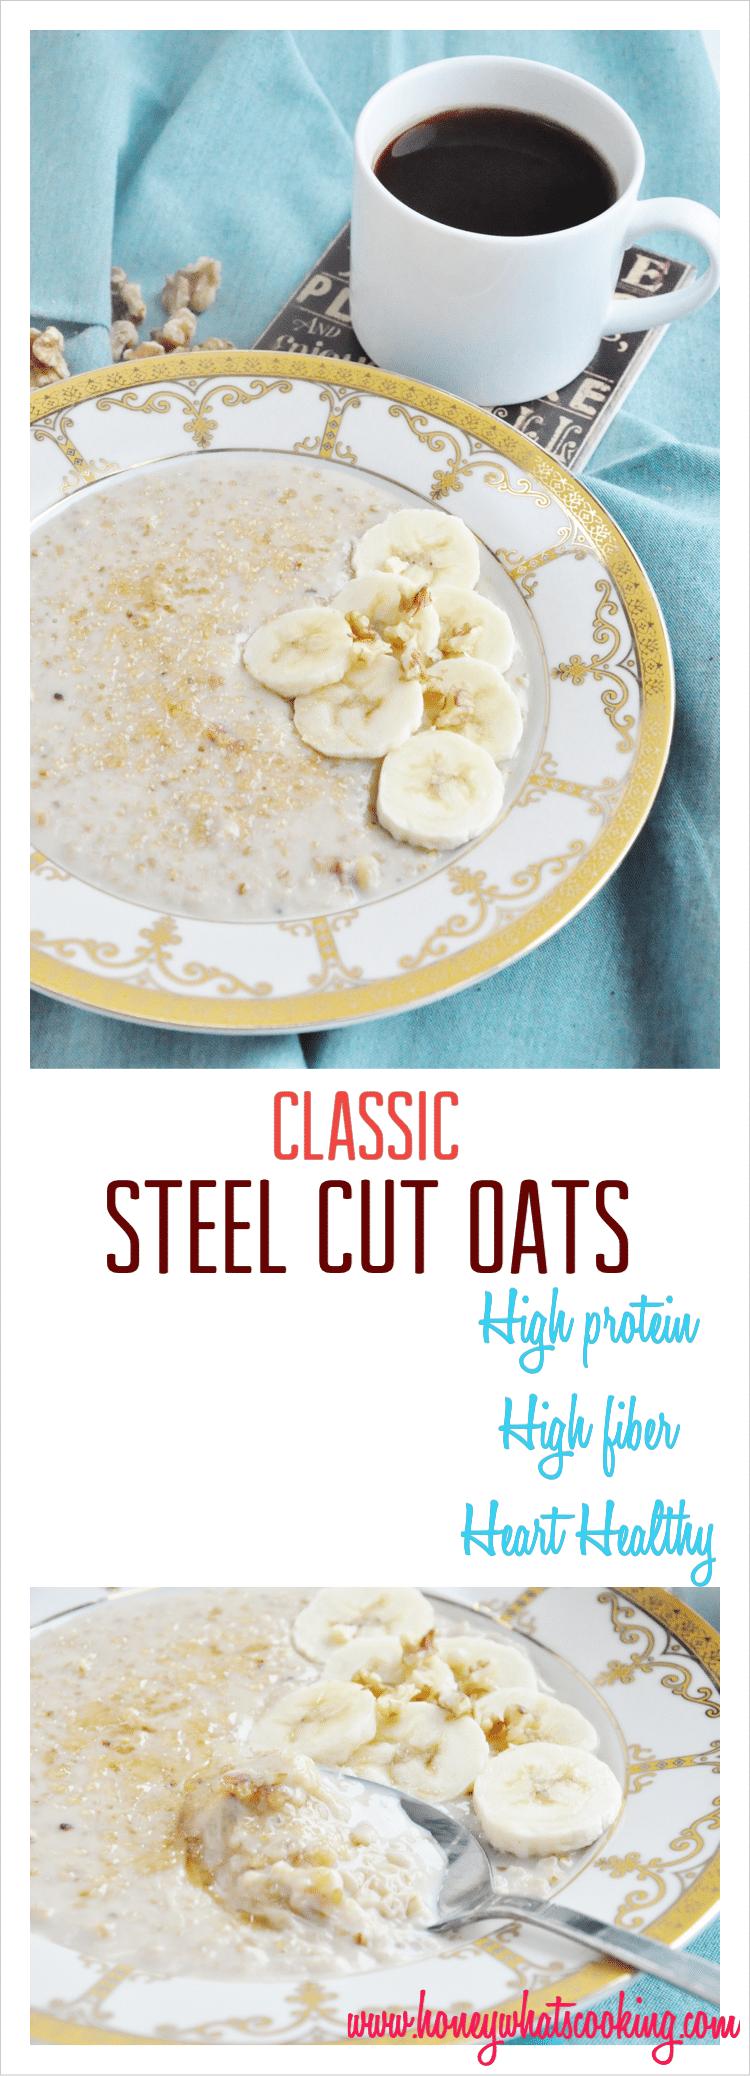 Classic Banana Walnut Steel Cut Oats pin